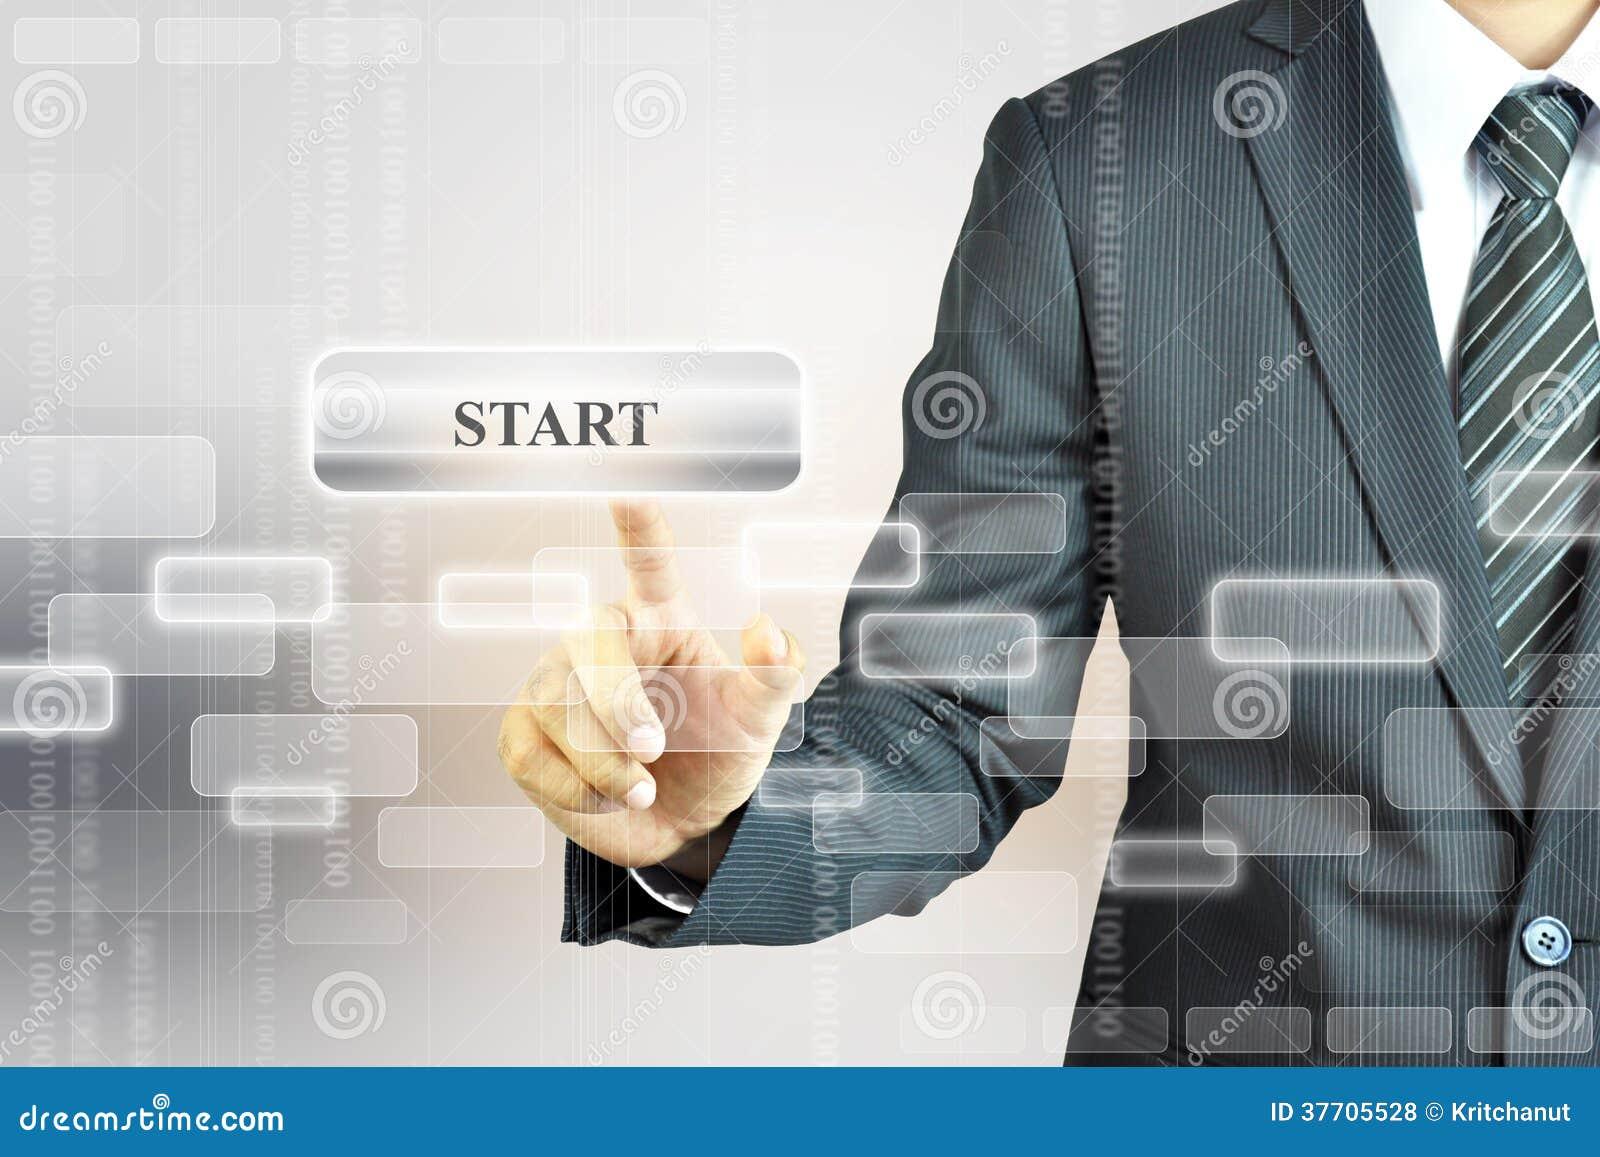 Businessman touching START button on virtual screen